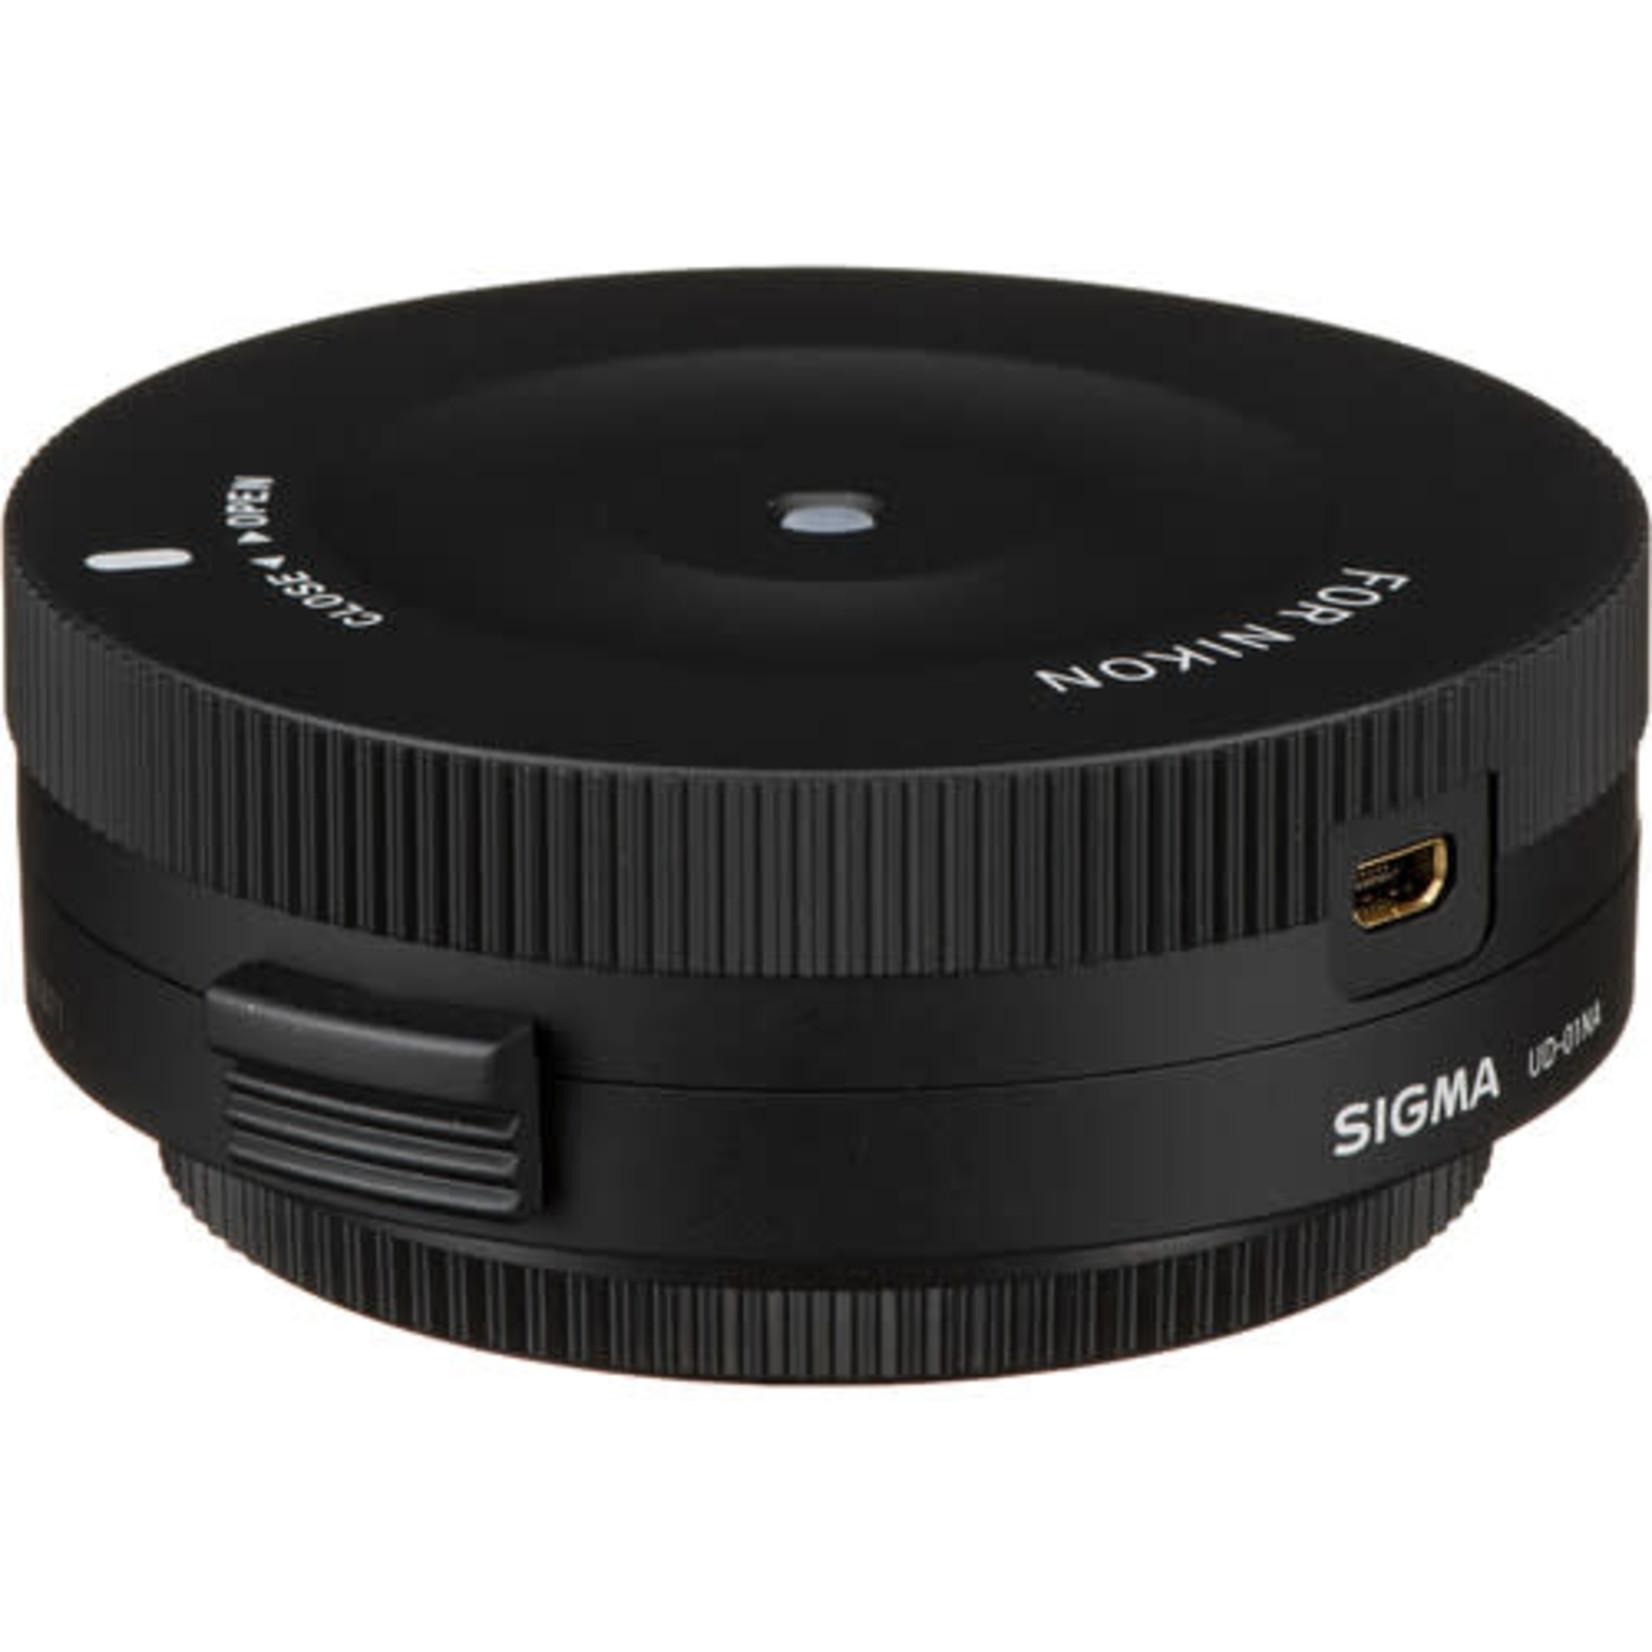 Sigma Sigma USB Dock for Nikon F-Mount Lenses